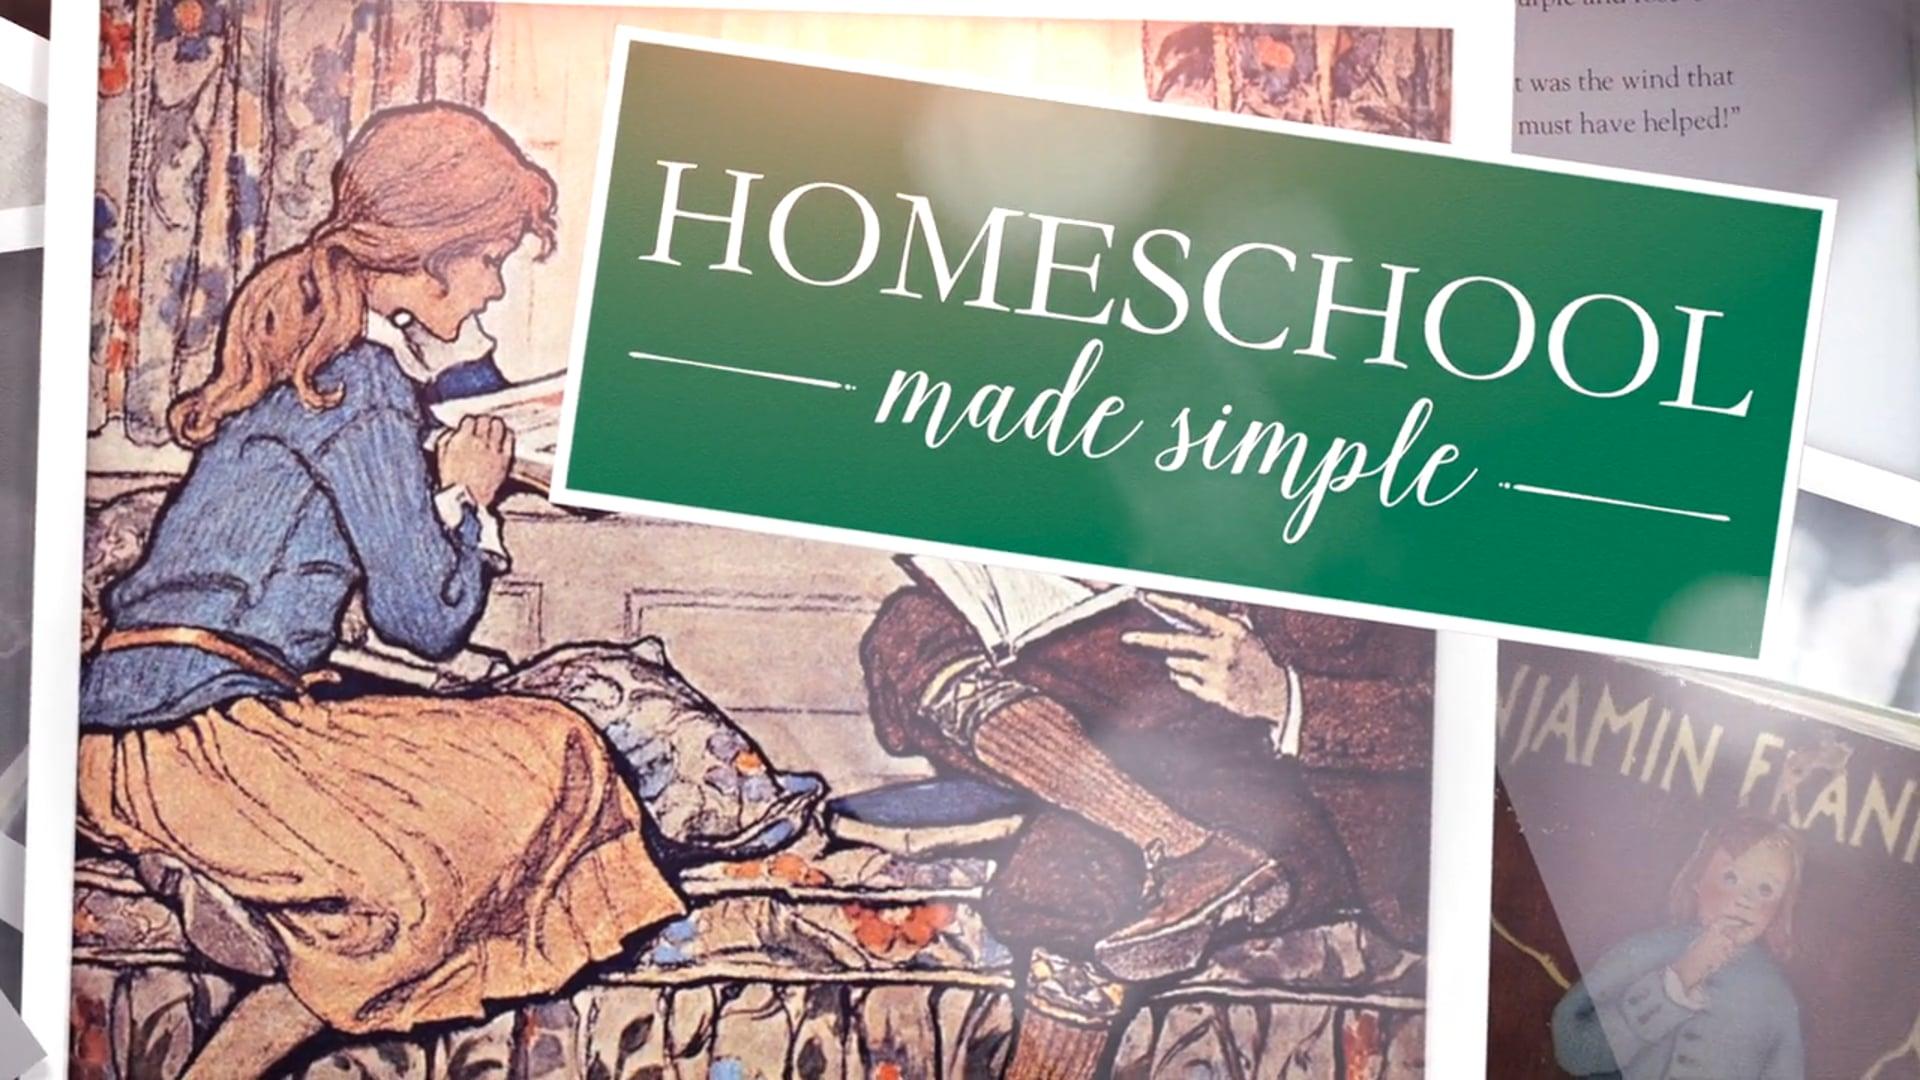 Homeschool Made Simple with Carole Joy Seid - Trailer